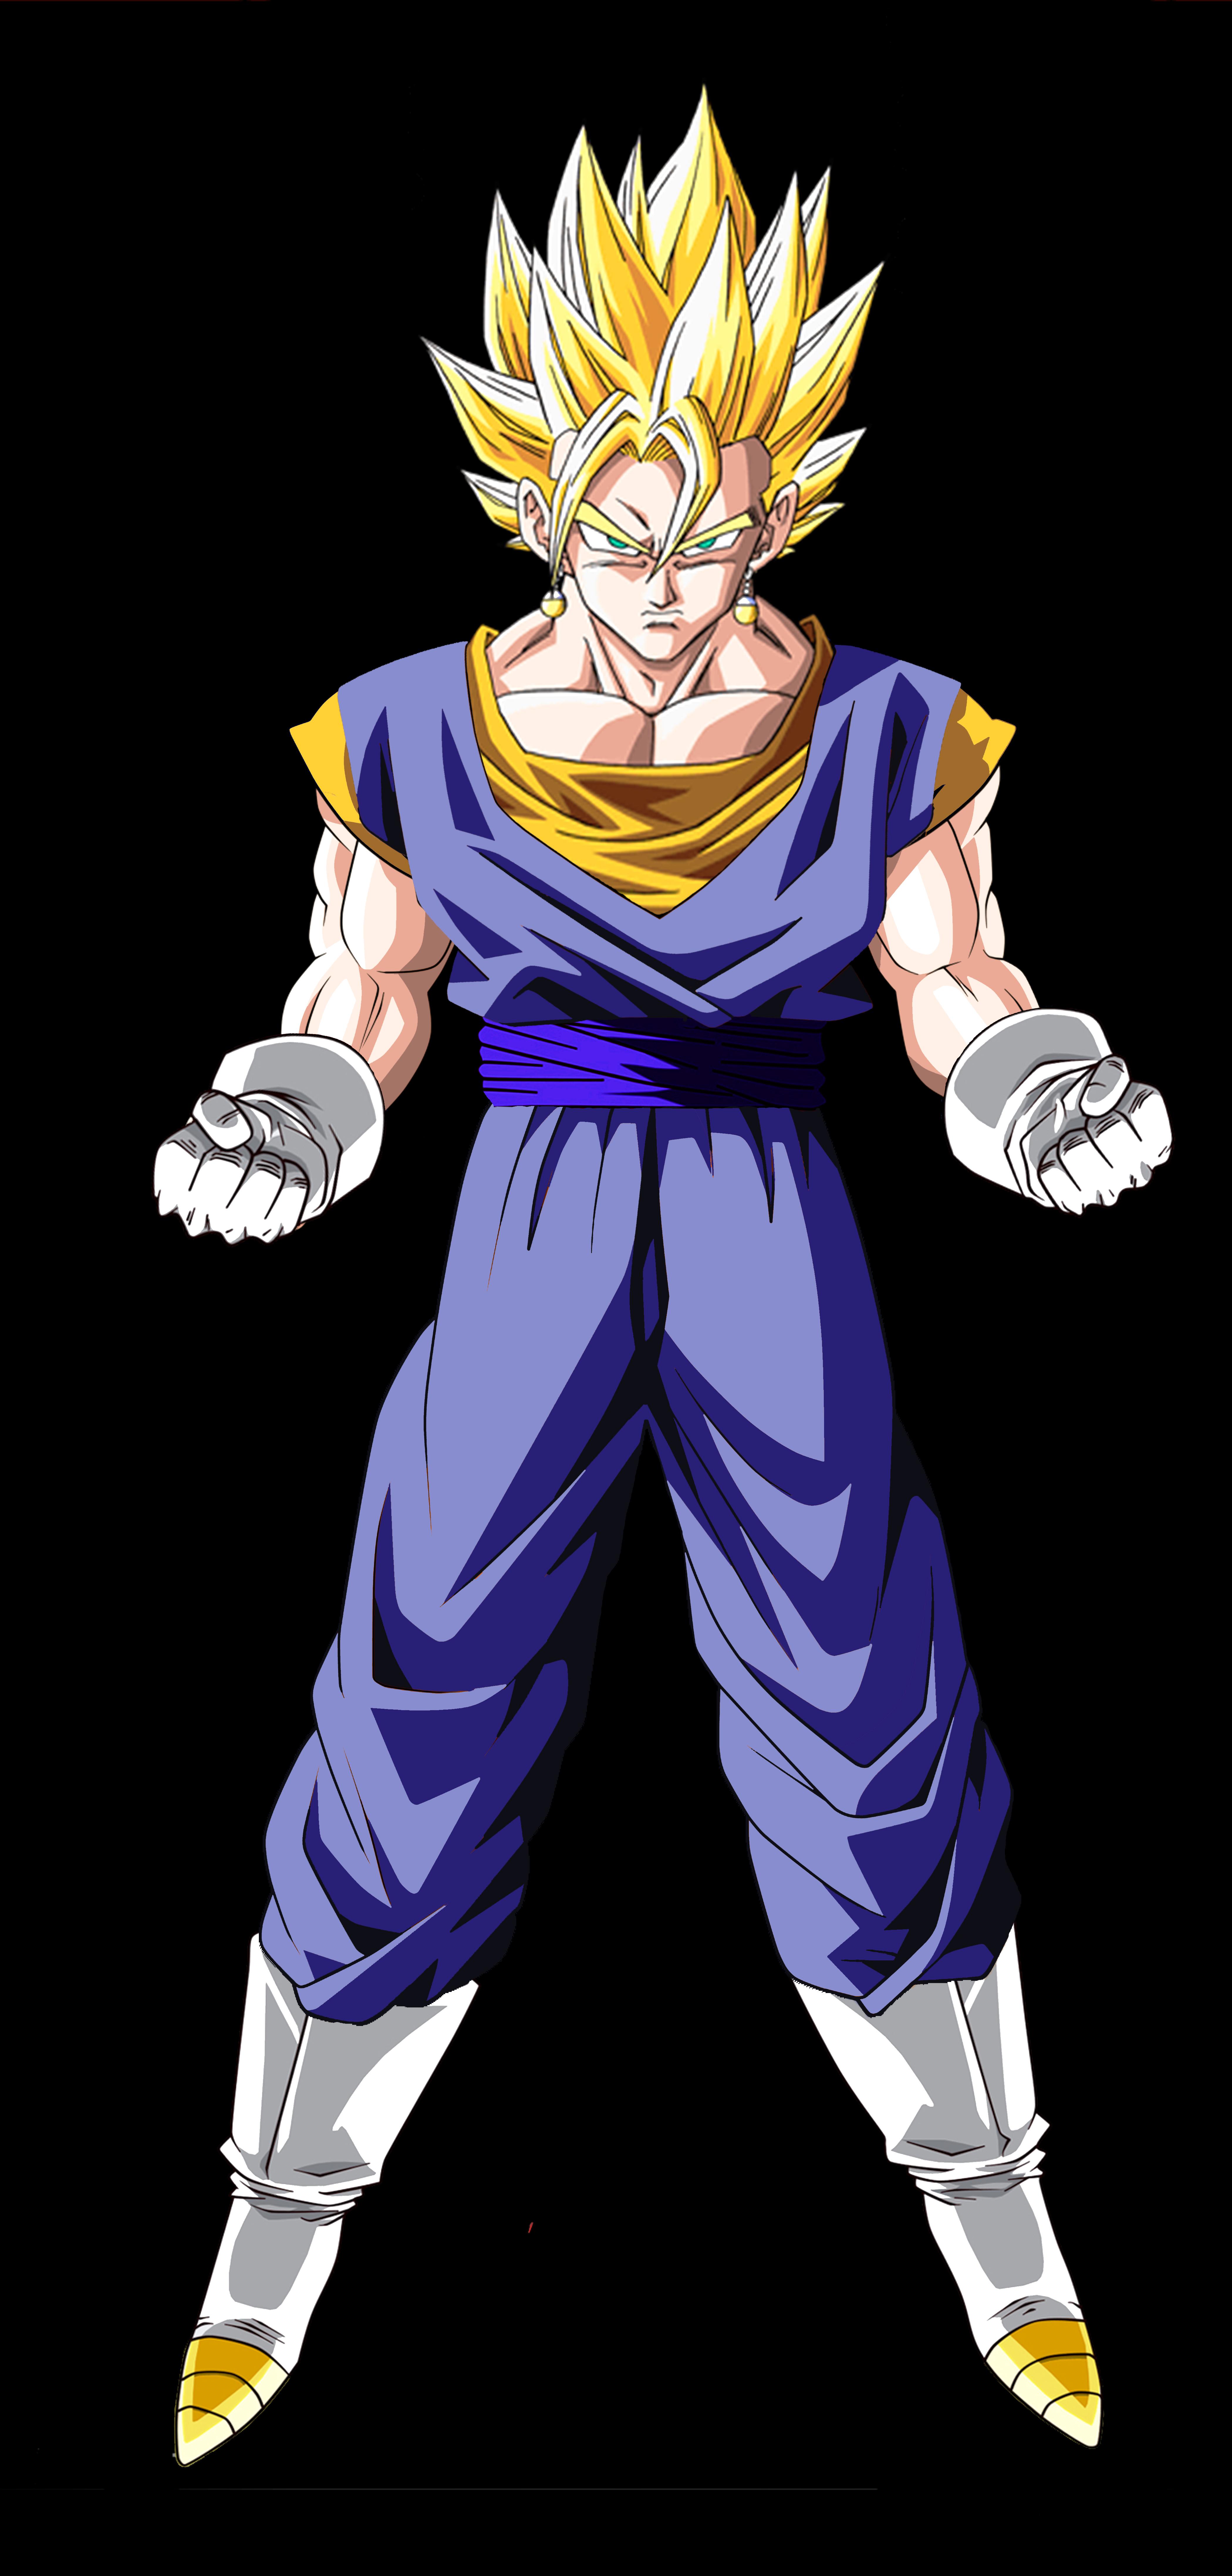 Goku ultra super saiyan latino dating 6